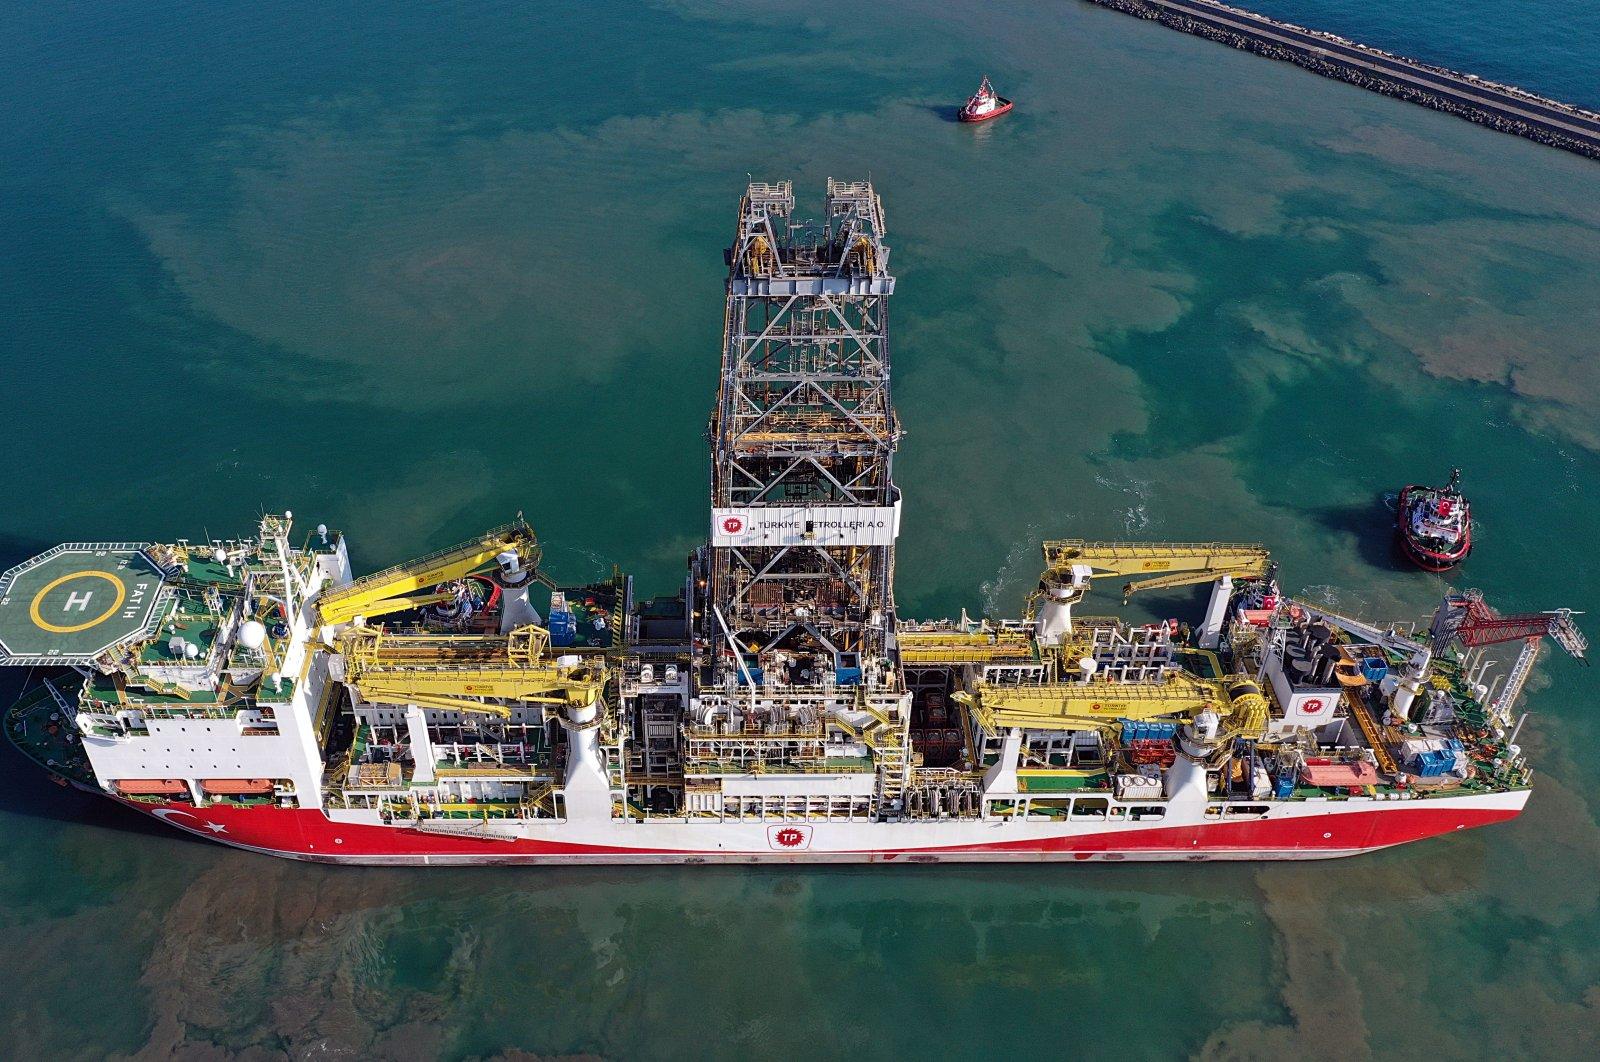 A drone photo shows the Turkish drillship Fatih leaving the Port of Trabzon for a drilling mission in the Black Sea, June 26, 2020. (AA Photo)   ( Hakan Burak Altunöz - Anadolu Ajansı )